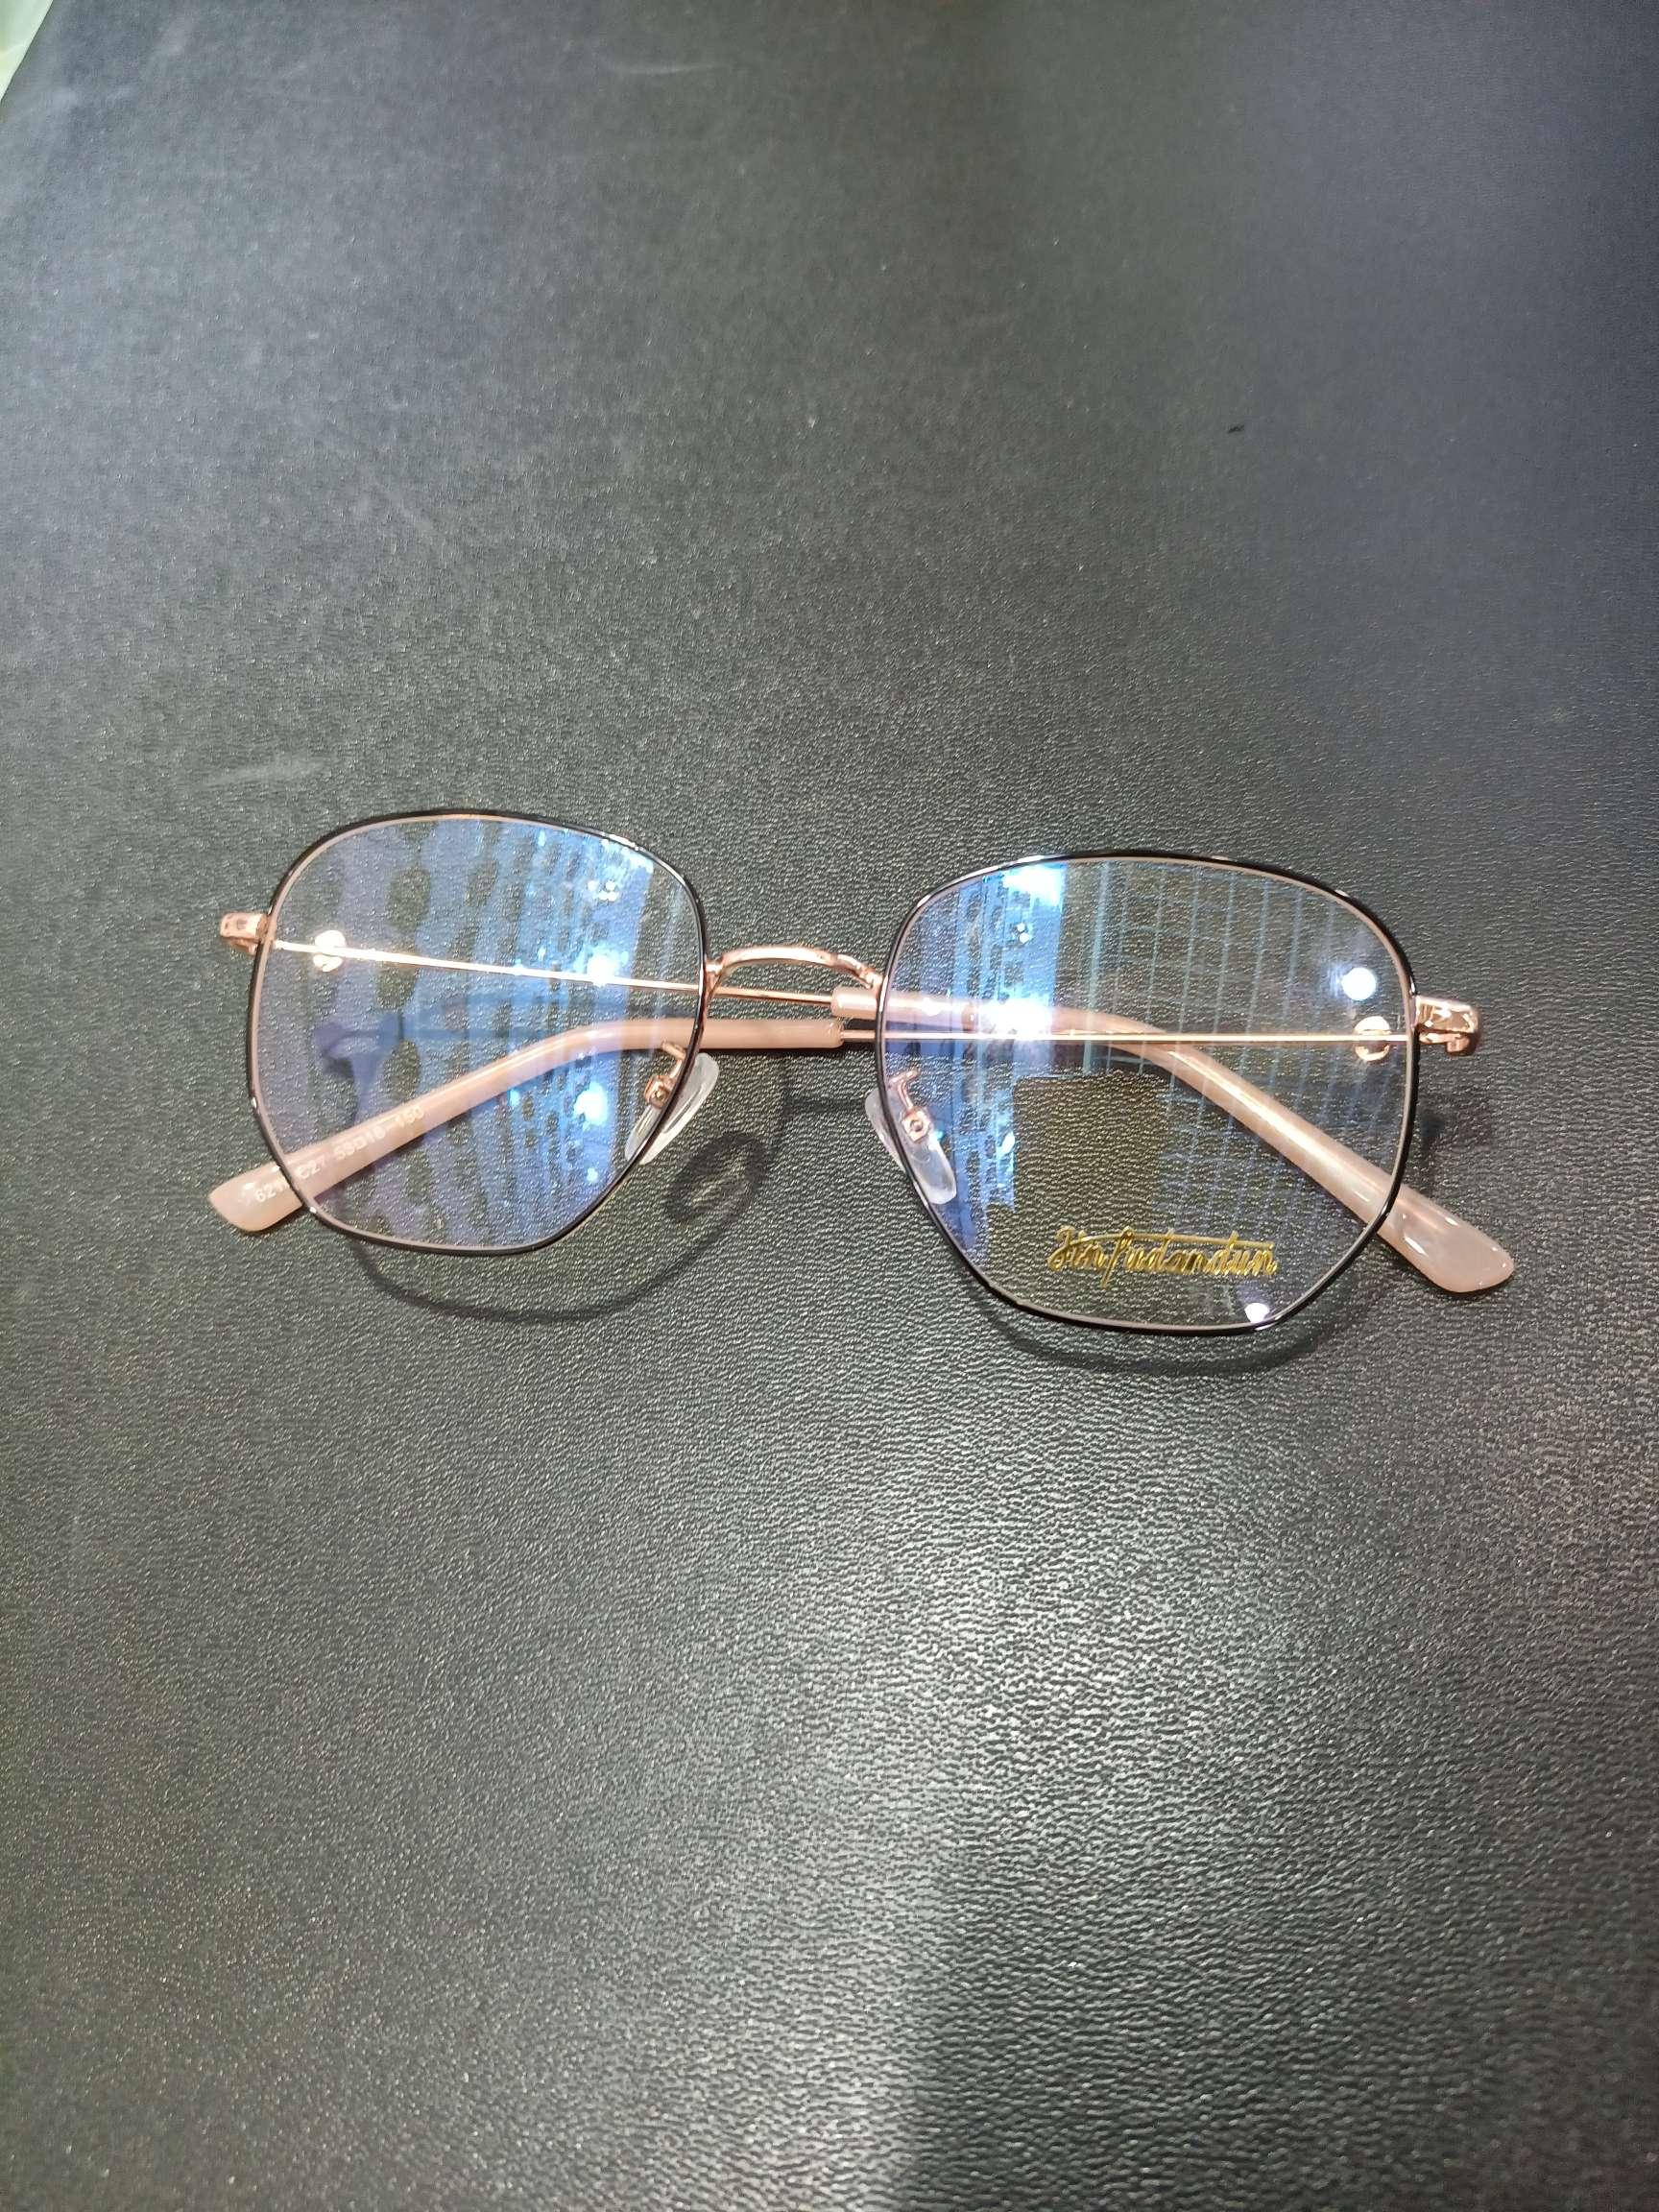 6210C一27新款镜架